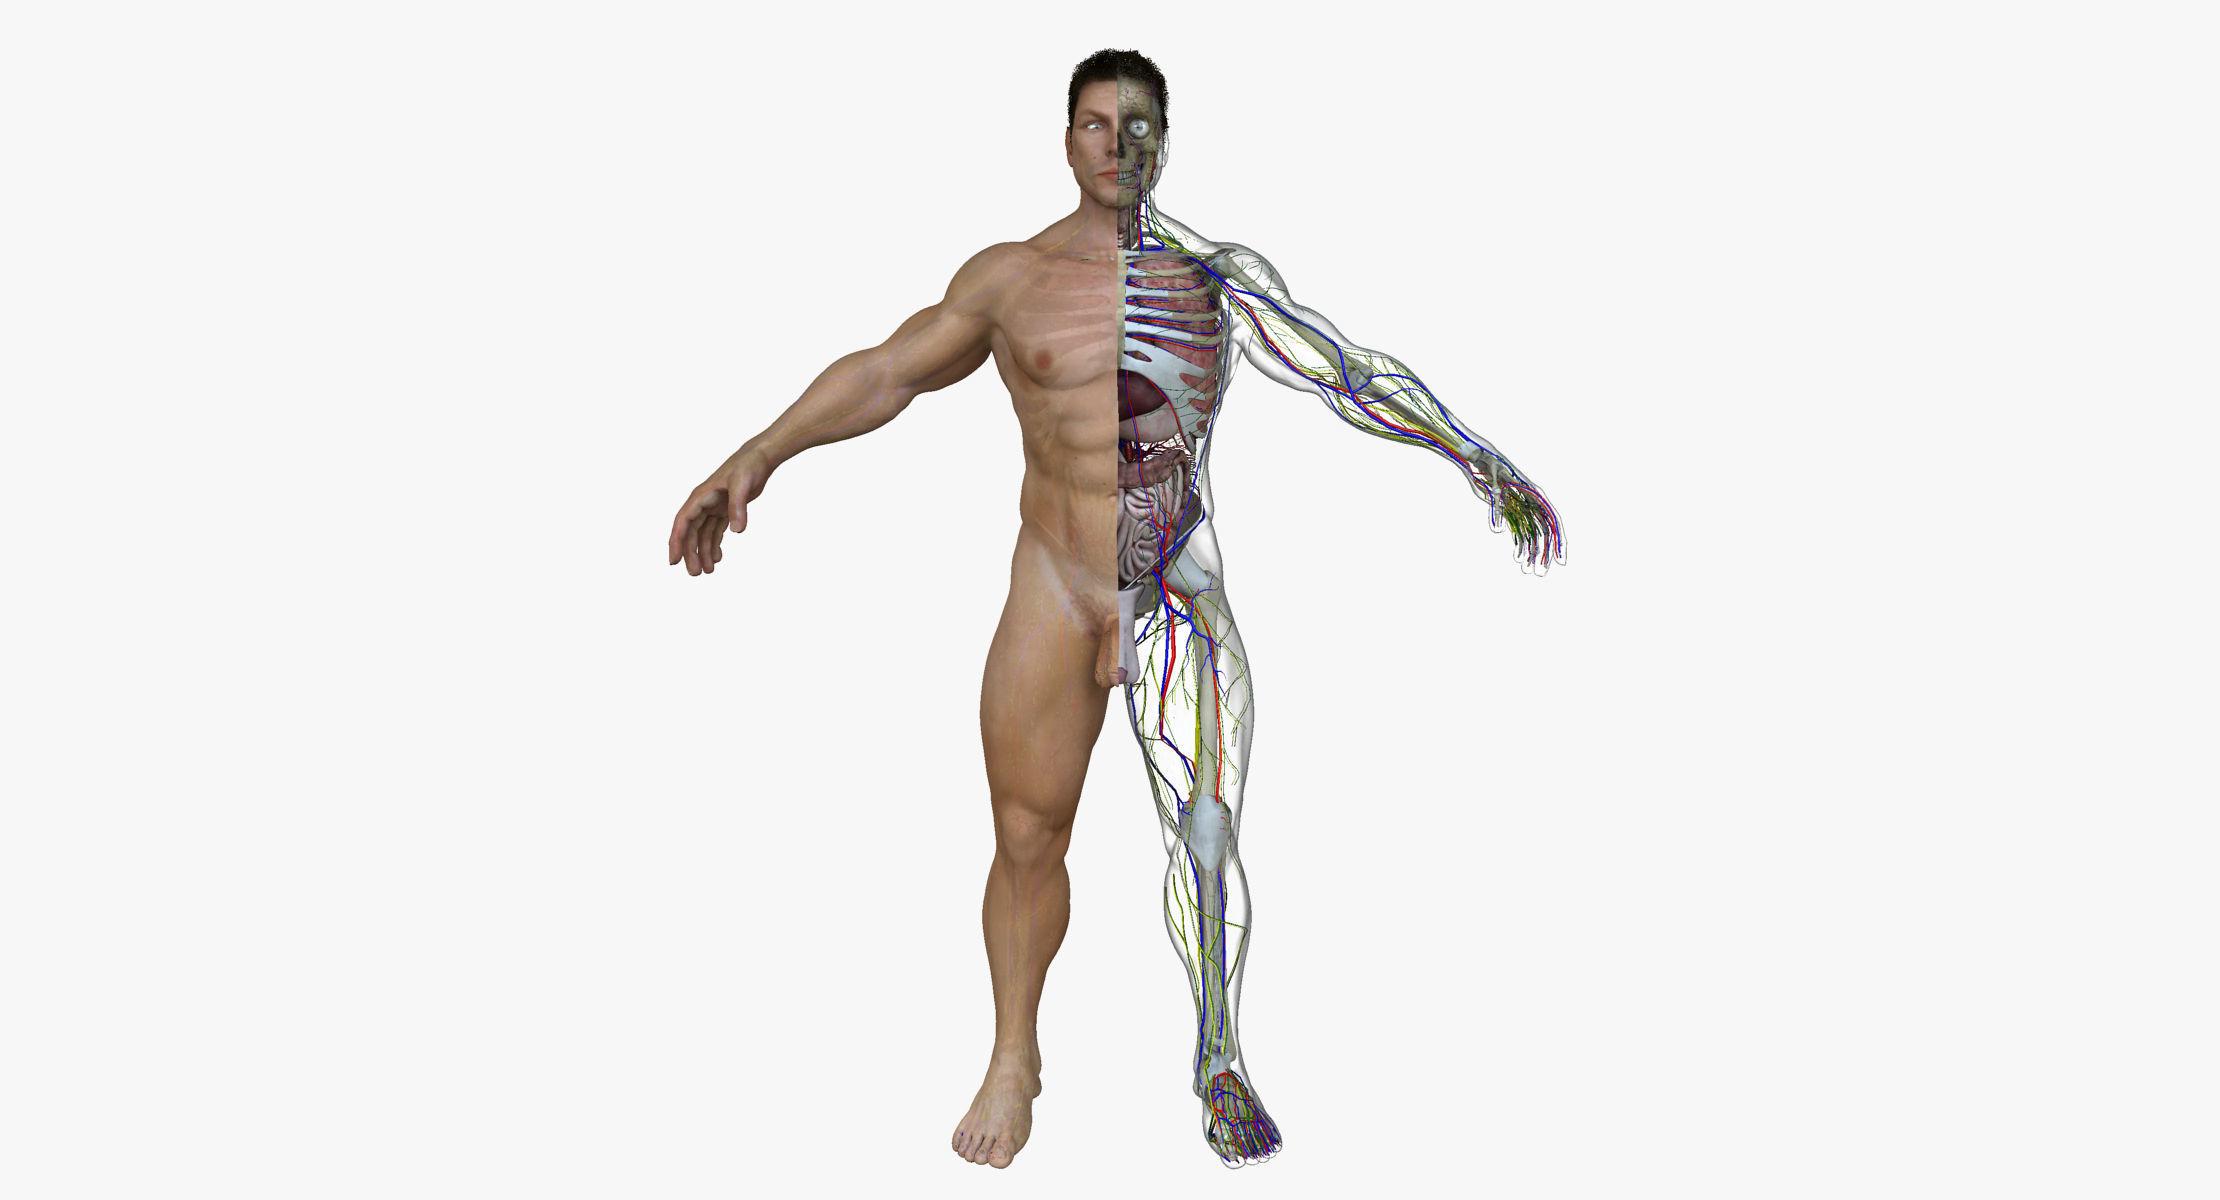 Human Male Full Body Anatomy